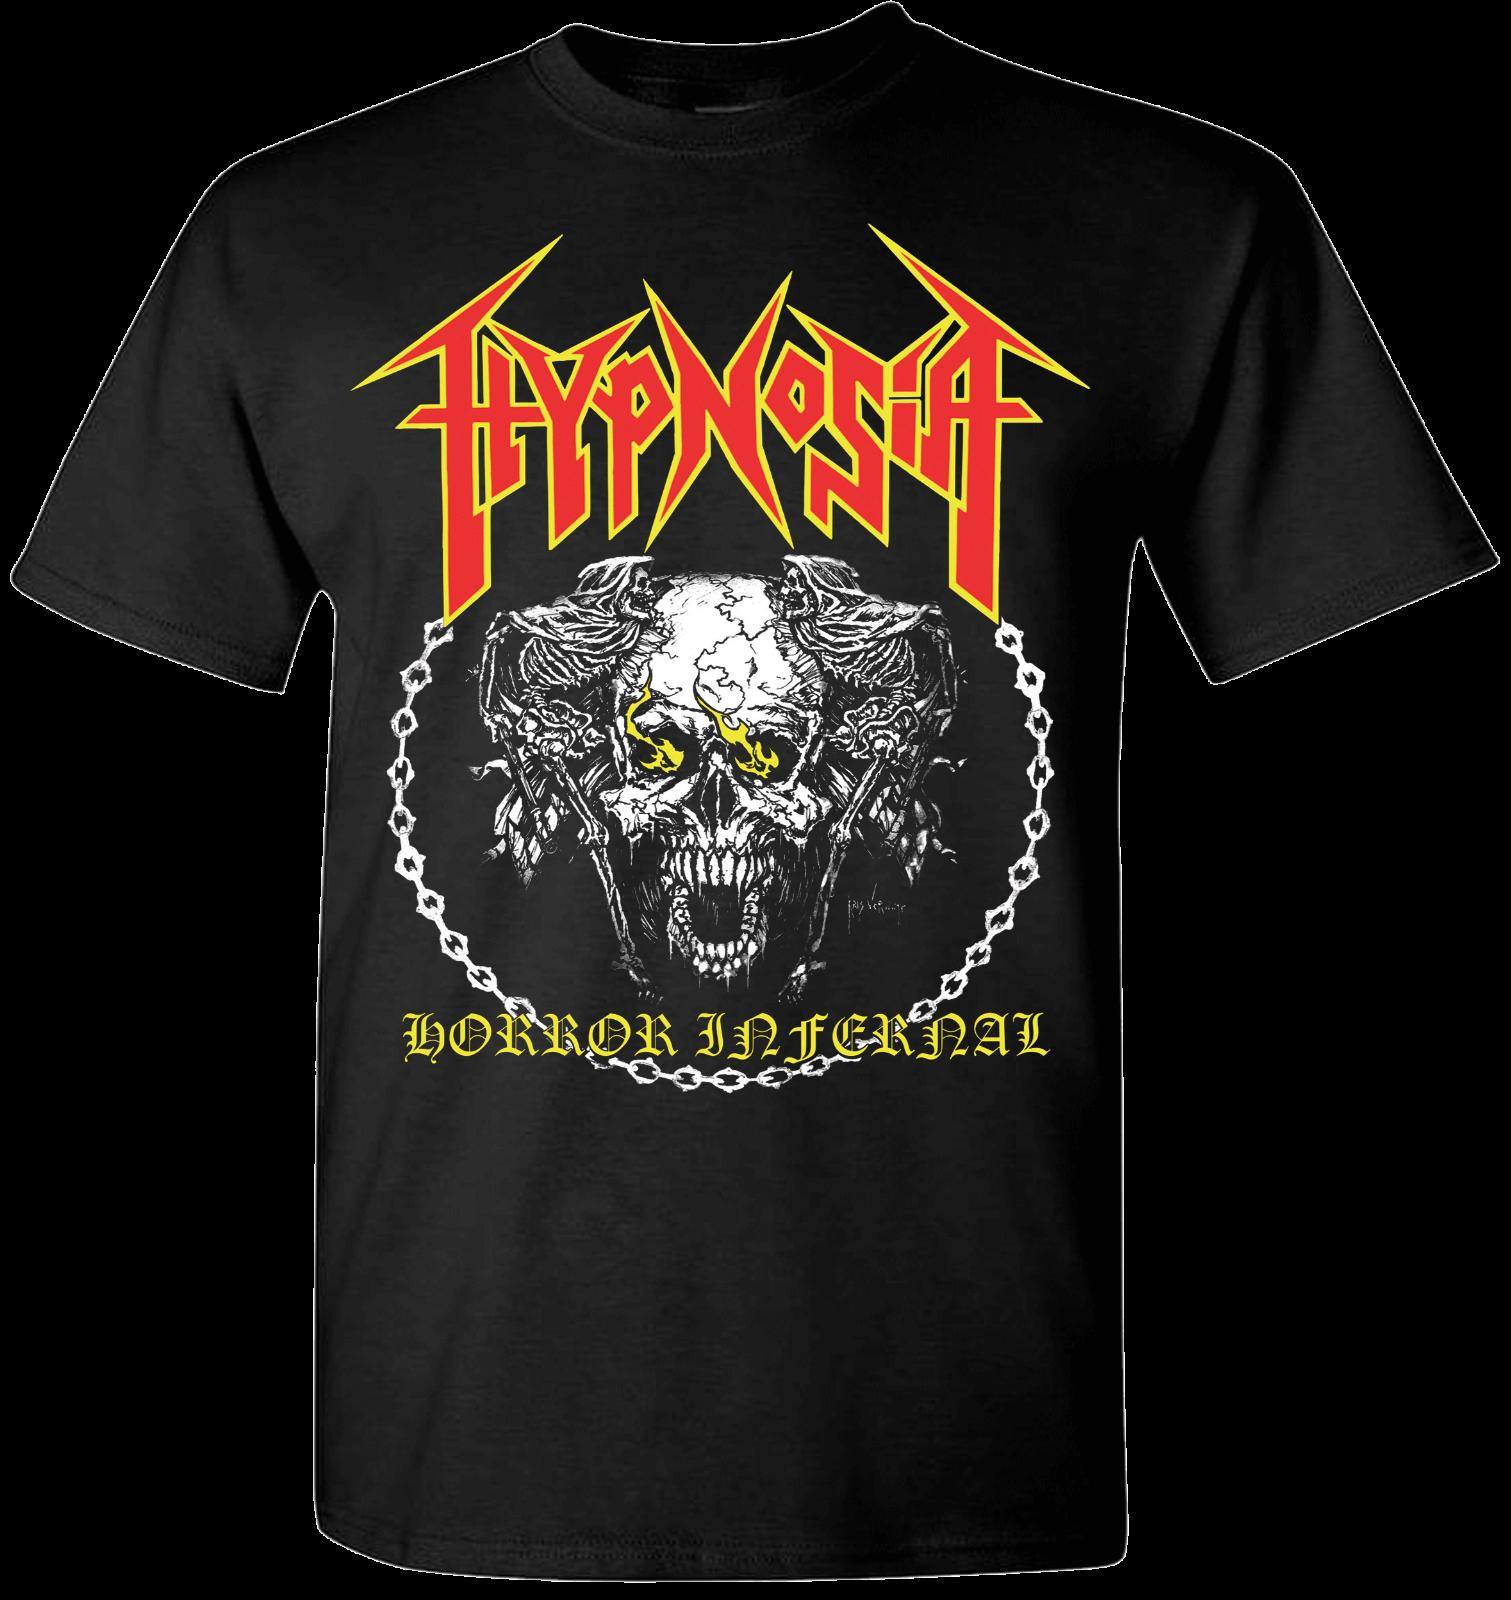 hypnosia horror infernal t shirt black metal death emperor blasphemy sarcofago Short Sleeve Summer Style Novelty O-Neck Tops